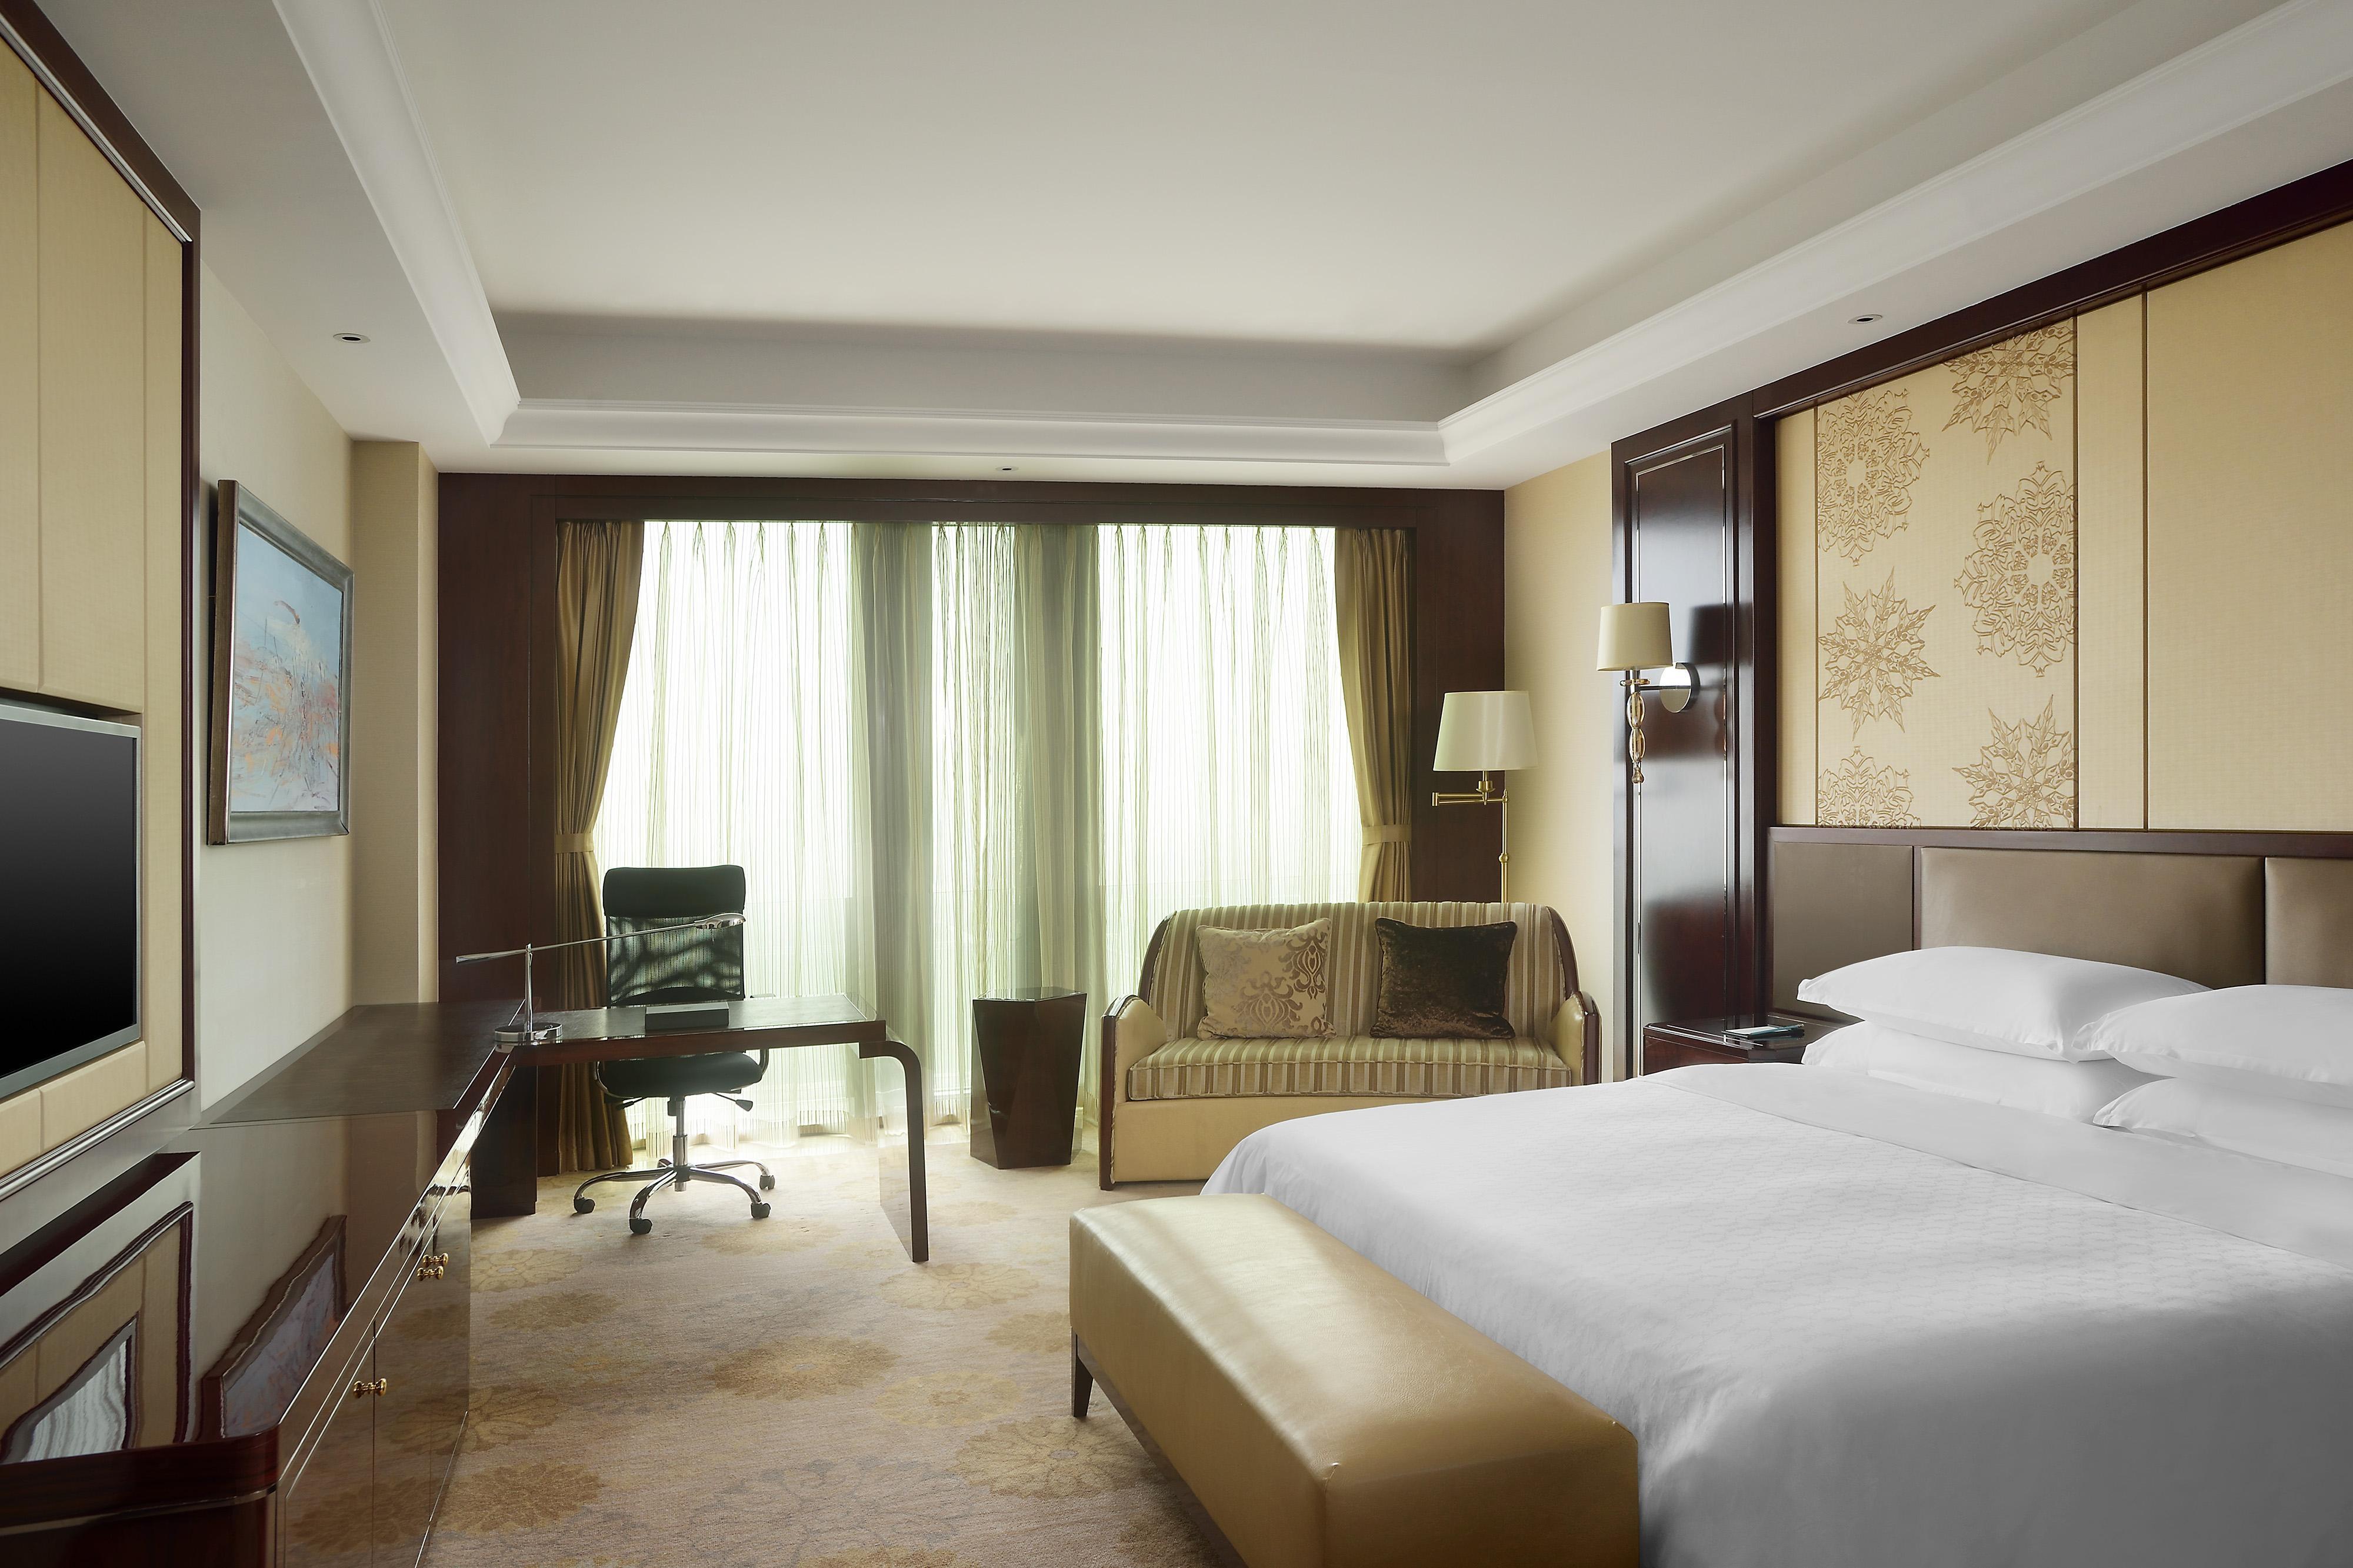 Executive Gästezimmer mit Kingsize-Bett